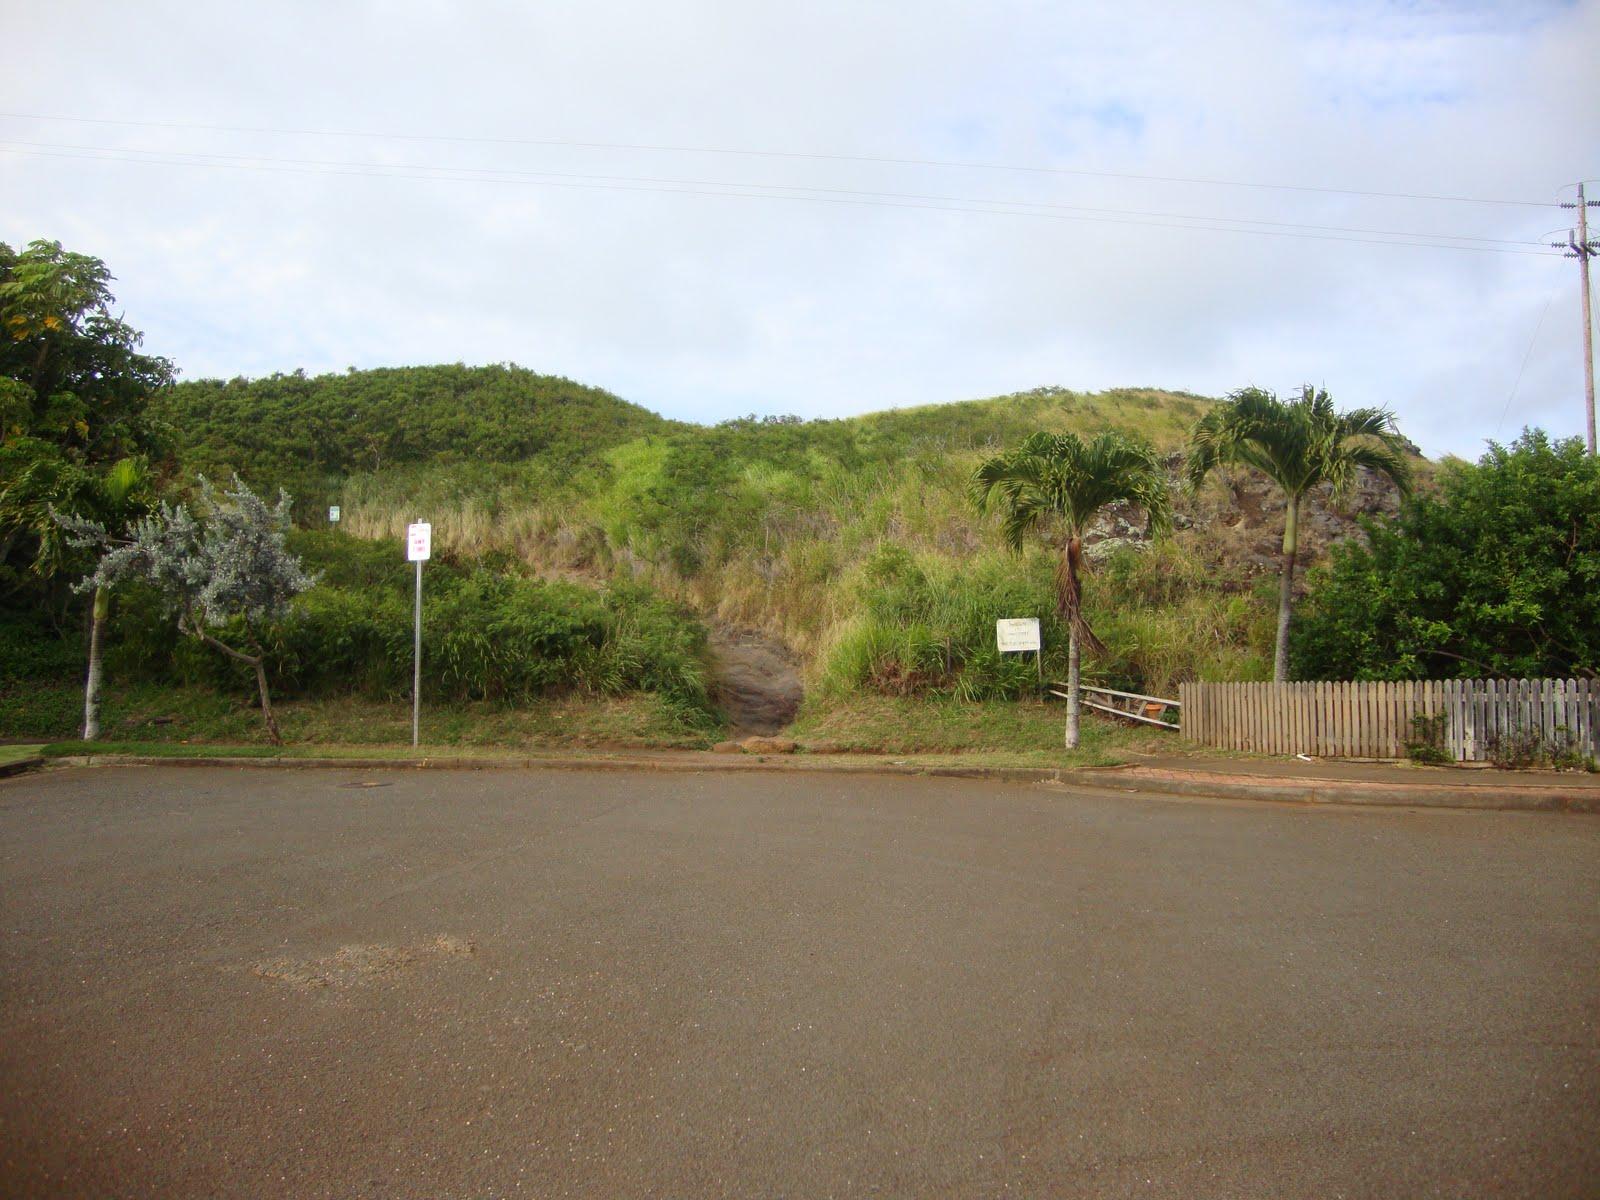 Ridge Hike Oahu Mariner's Ridge Hike